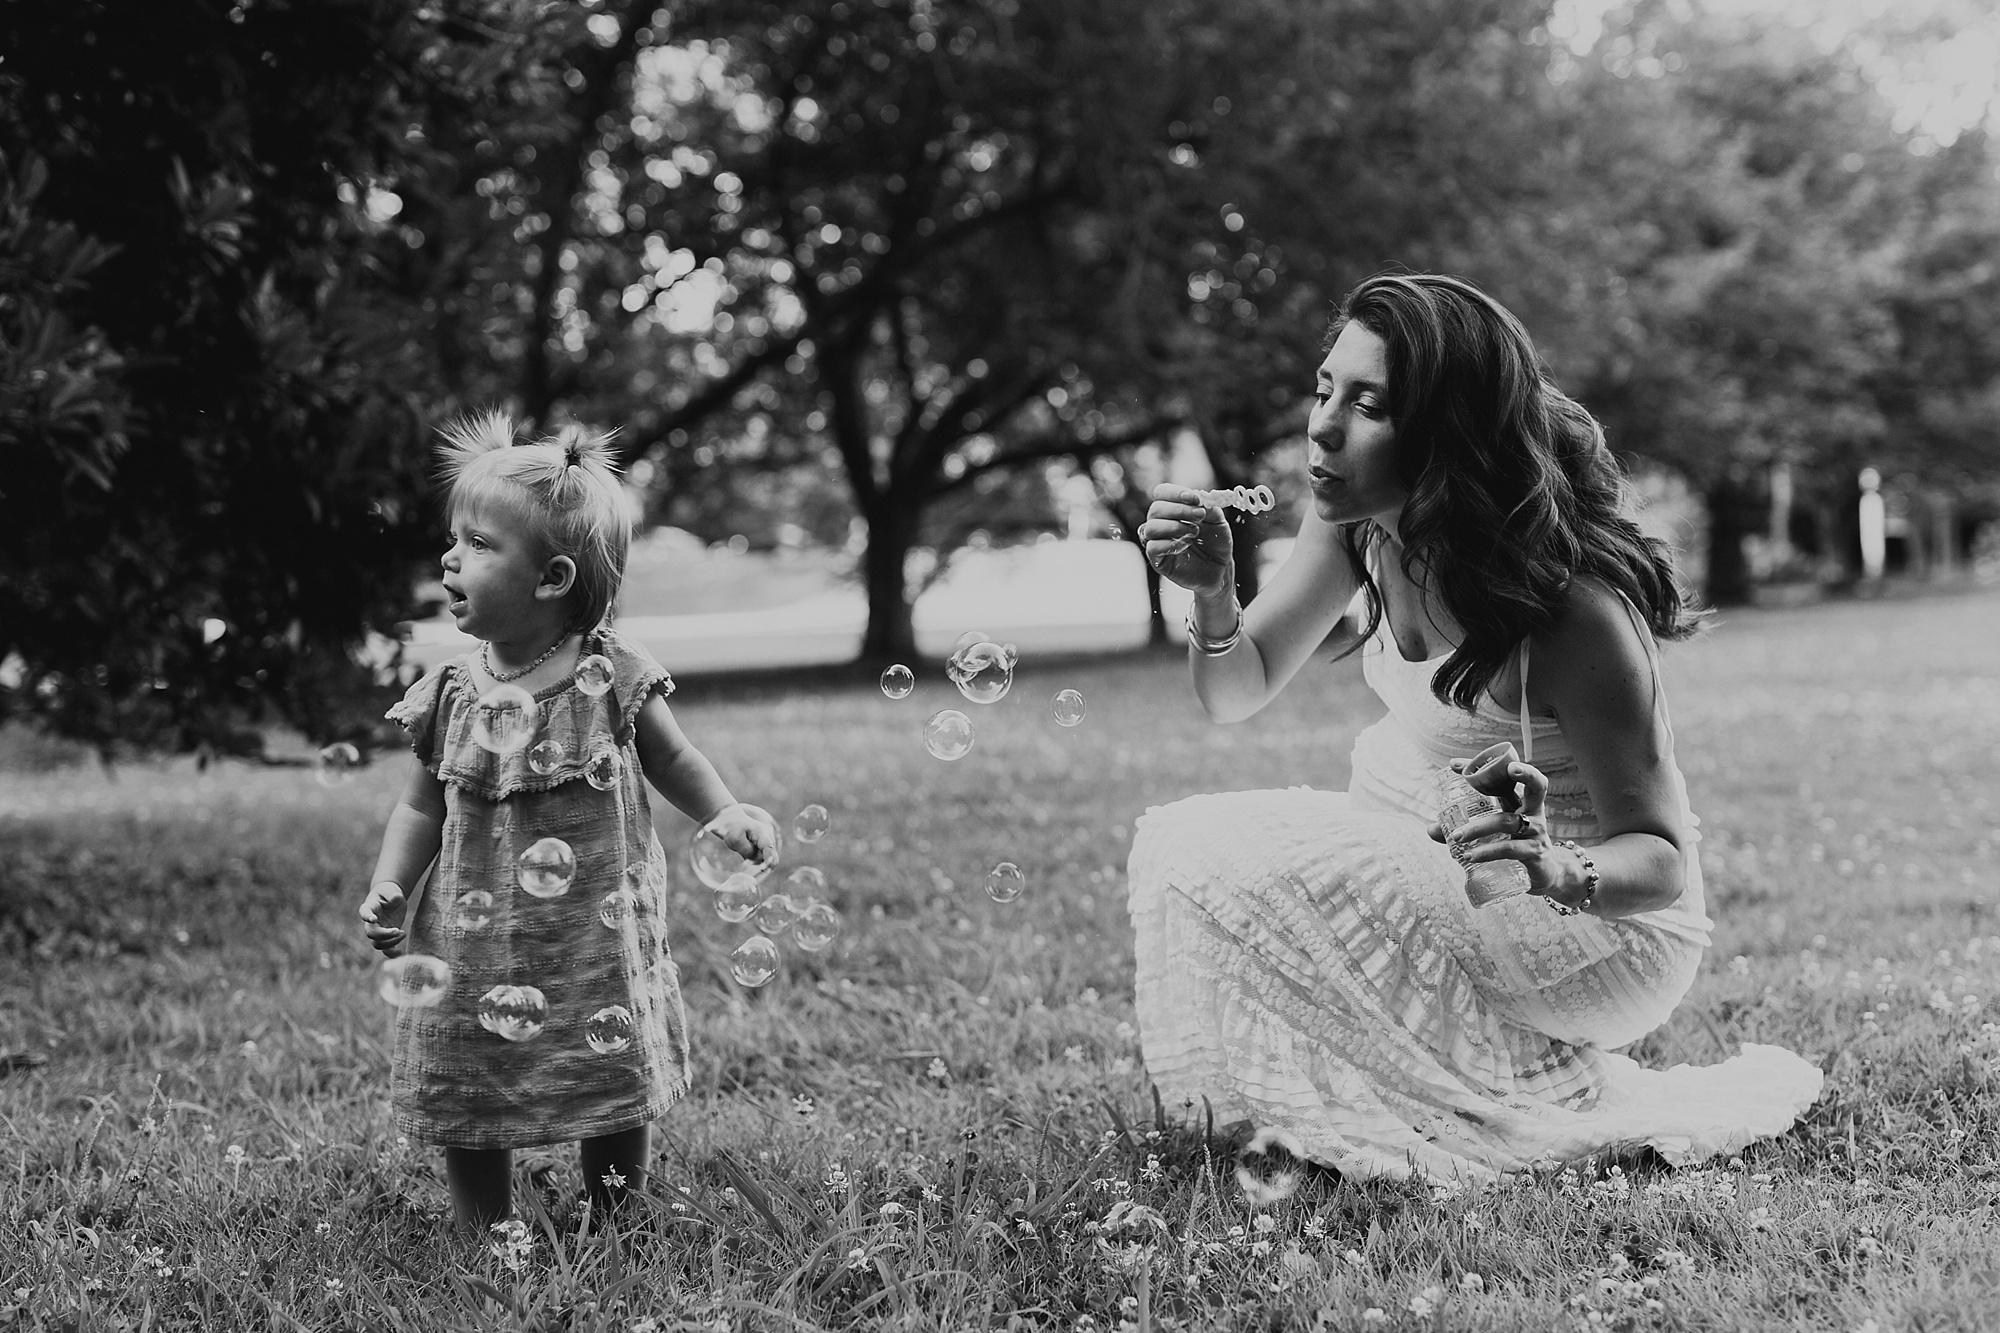 Joe_Mac_Creative_Maternity_West_Chester_Wedding_Photography_Philly_Best_Philadlephia__0159.jpg